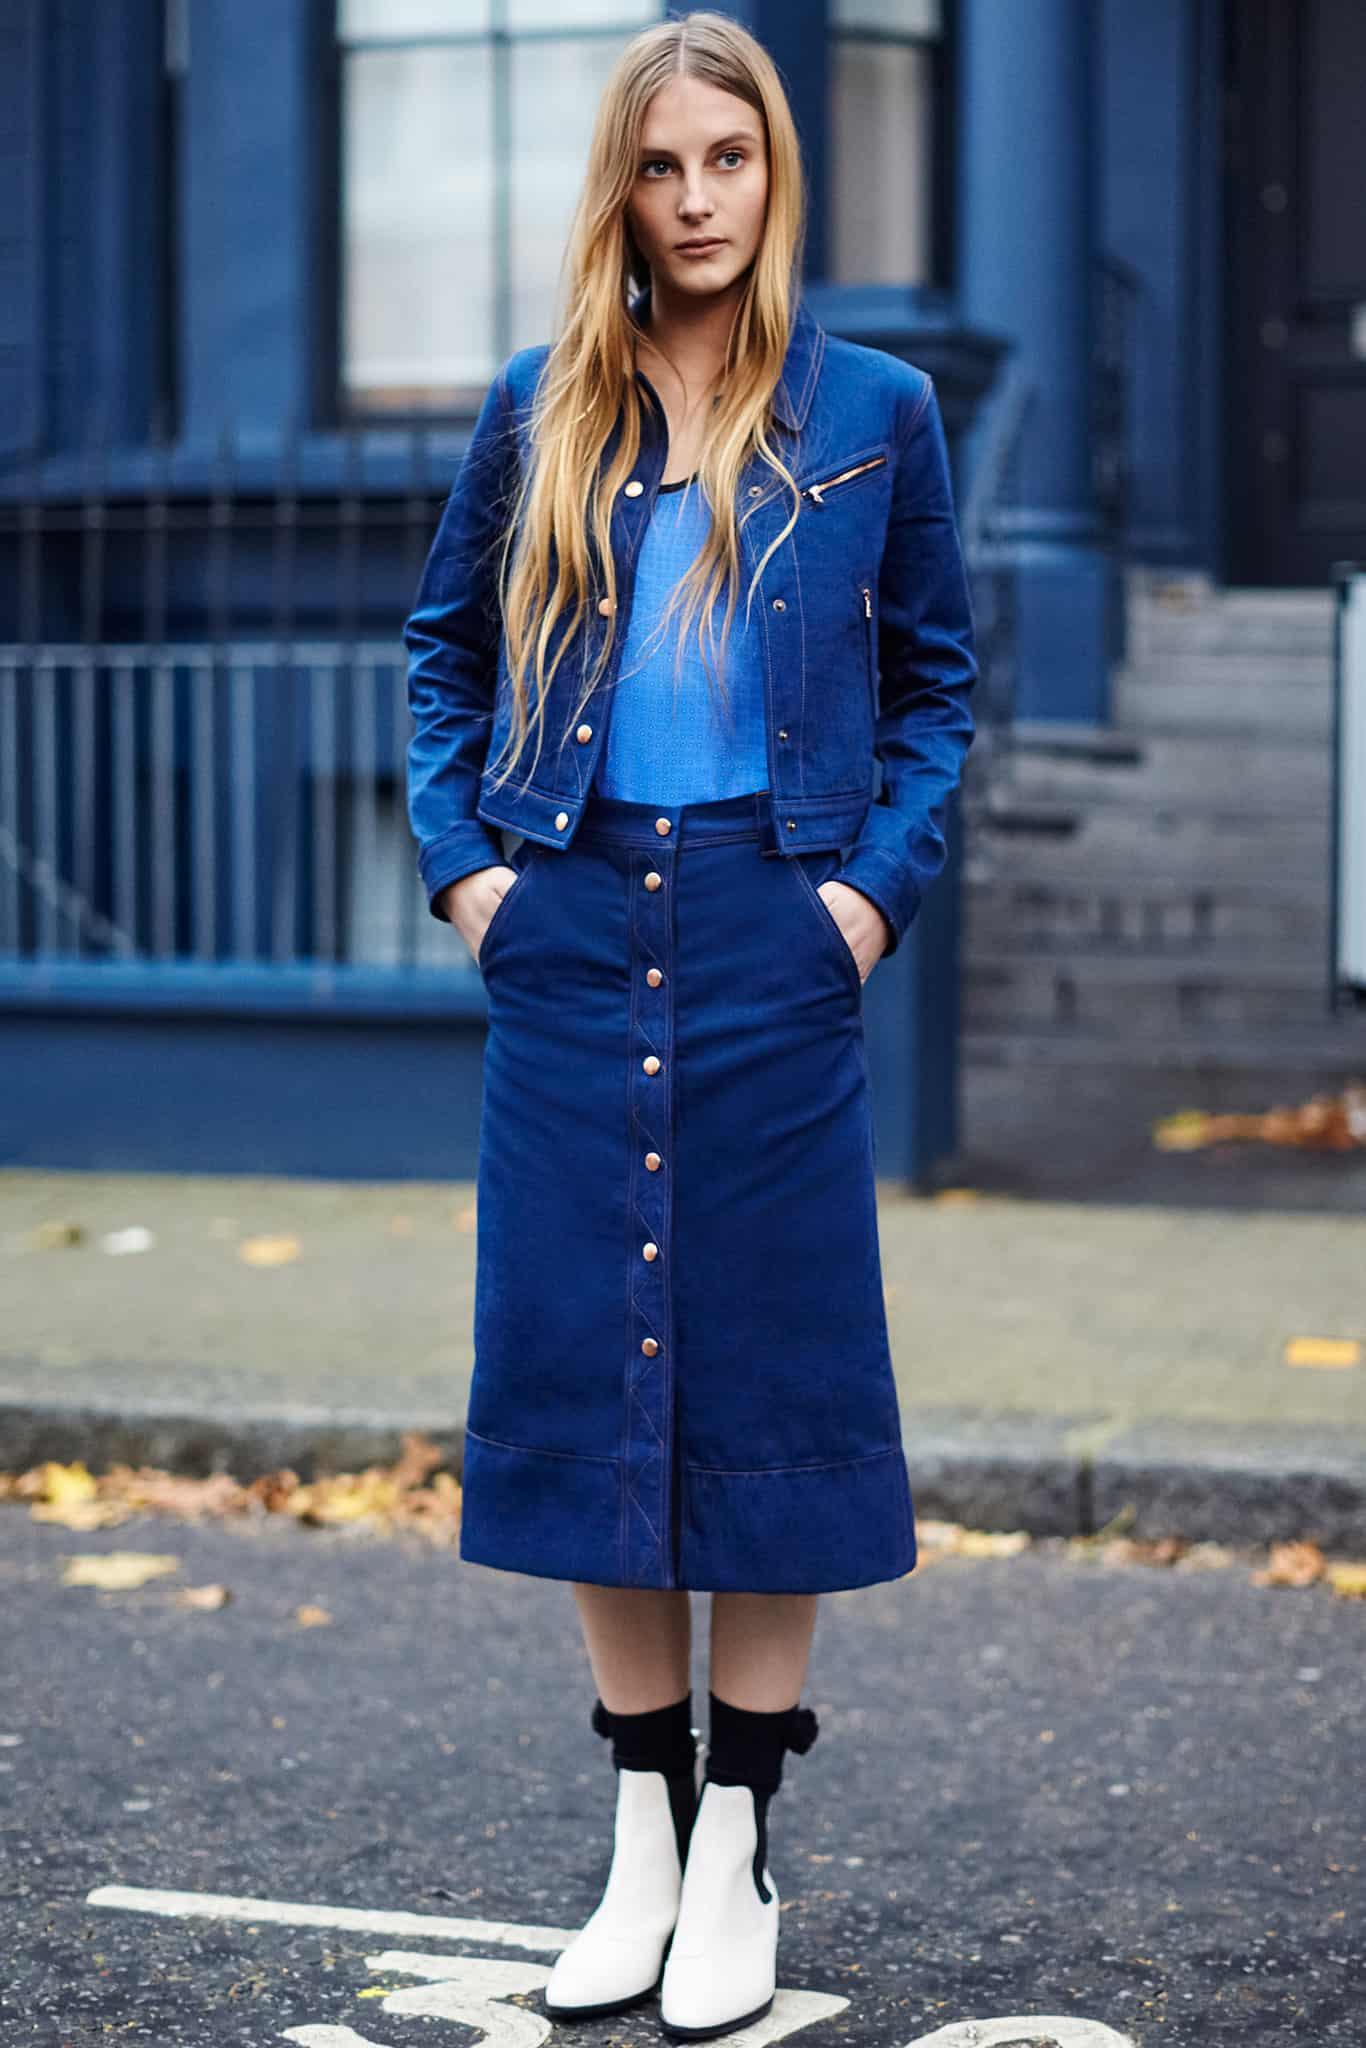 spring-2015-trend-denim-skirts